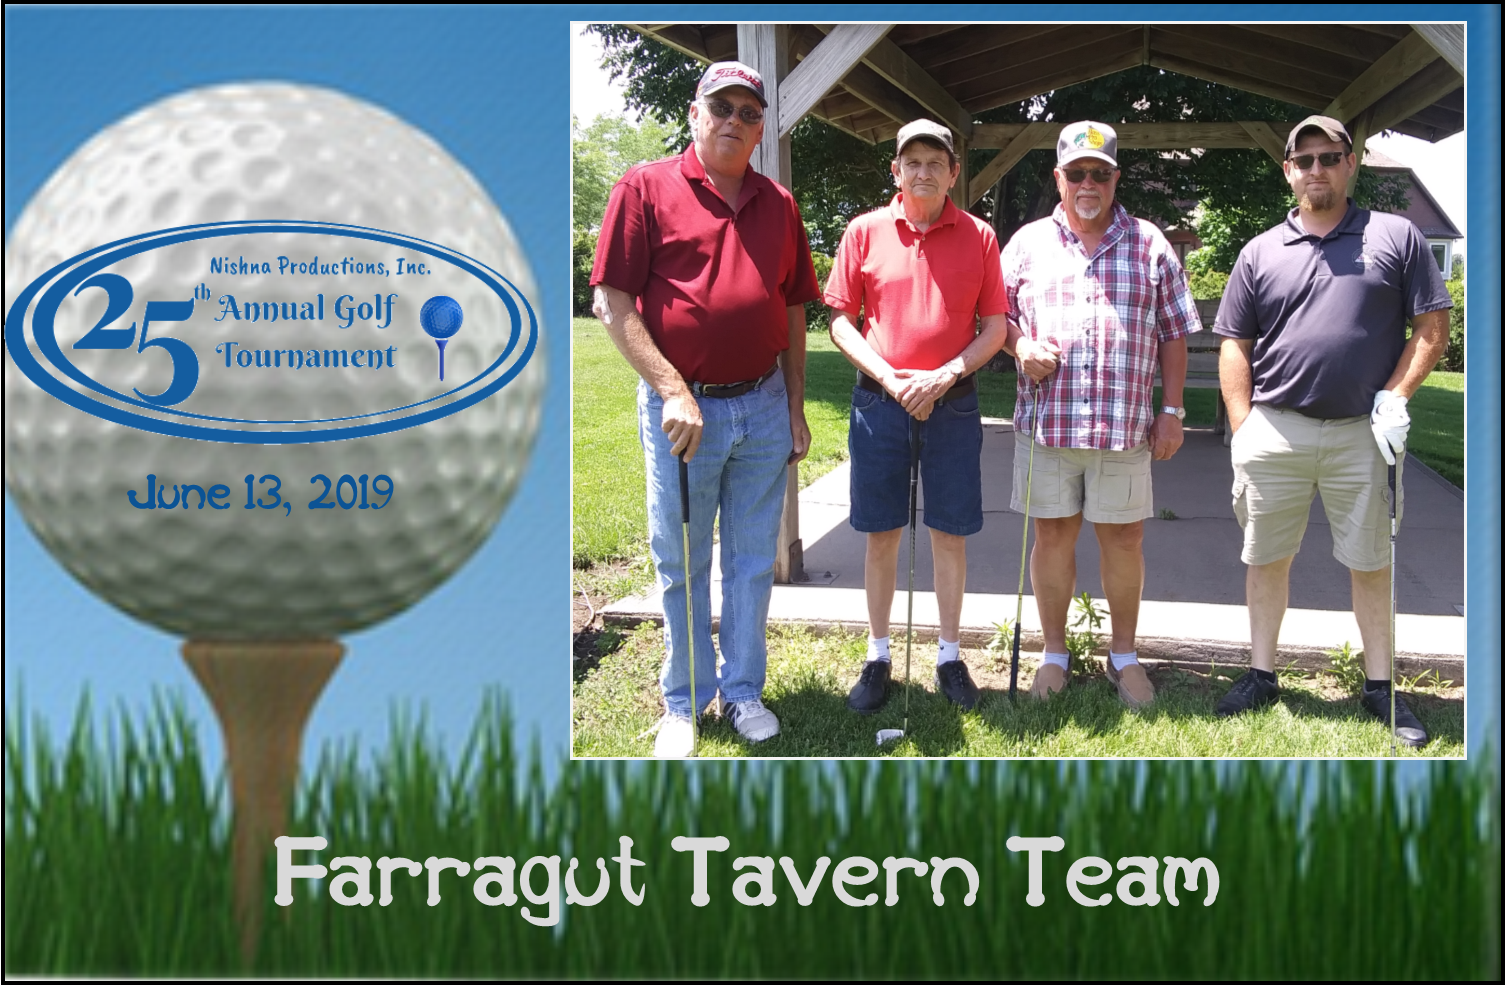 Farragut Tavern Team